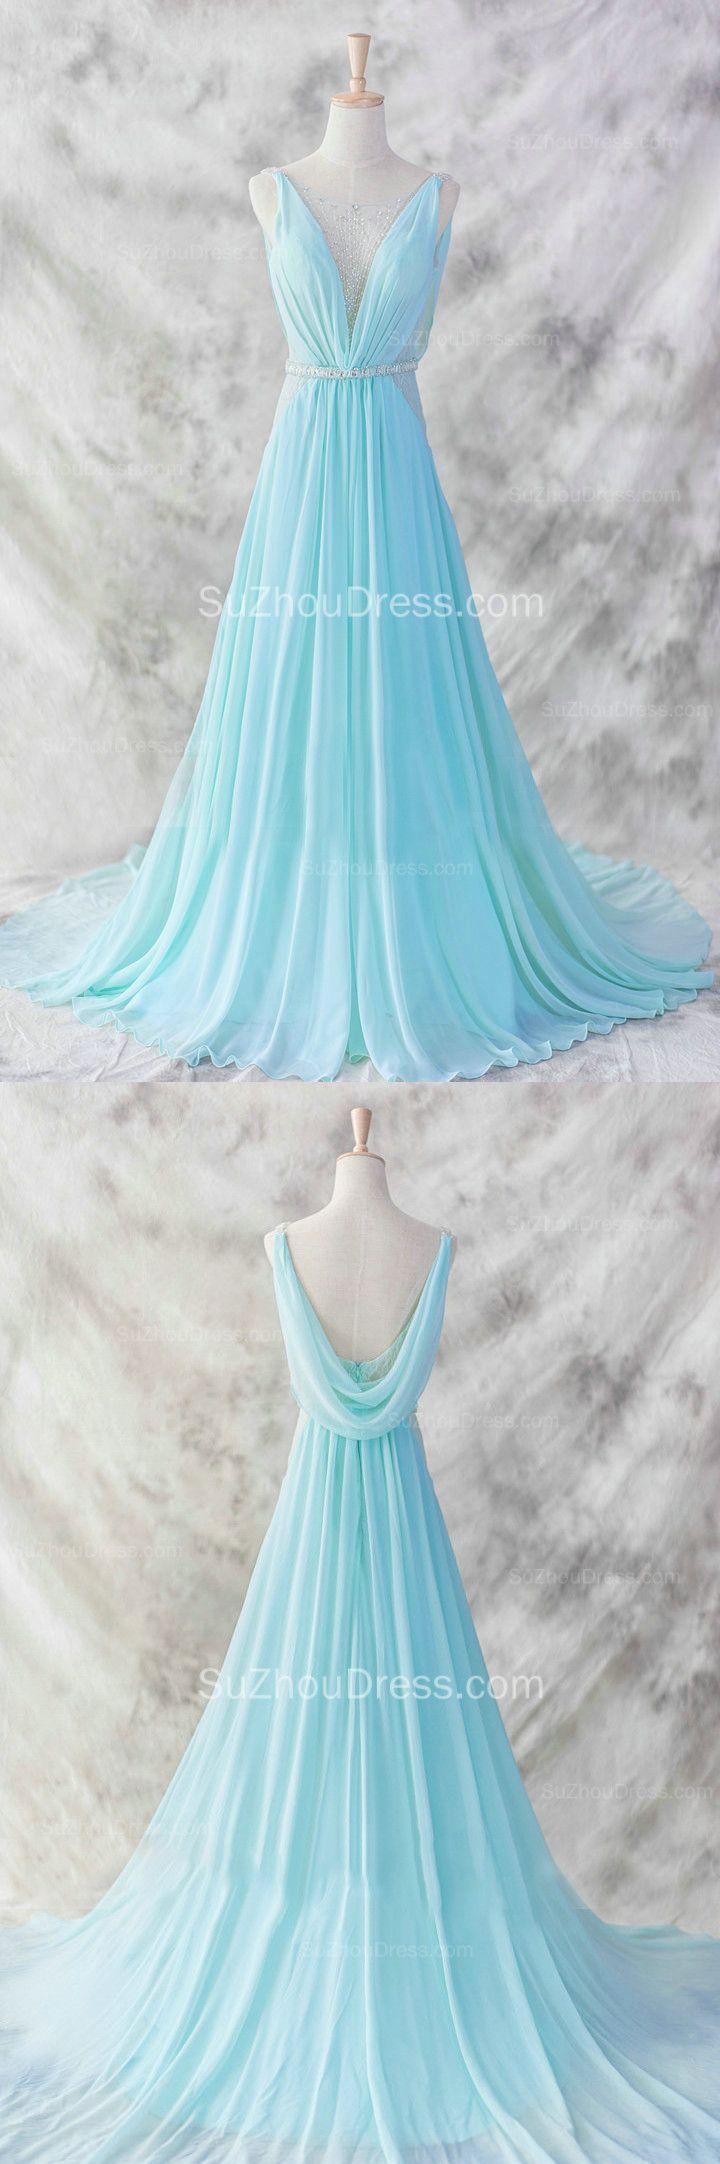 1950s prom dress cheap – fashion dresses